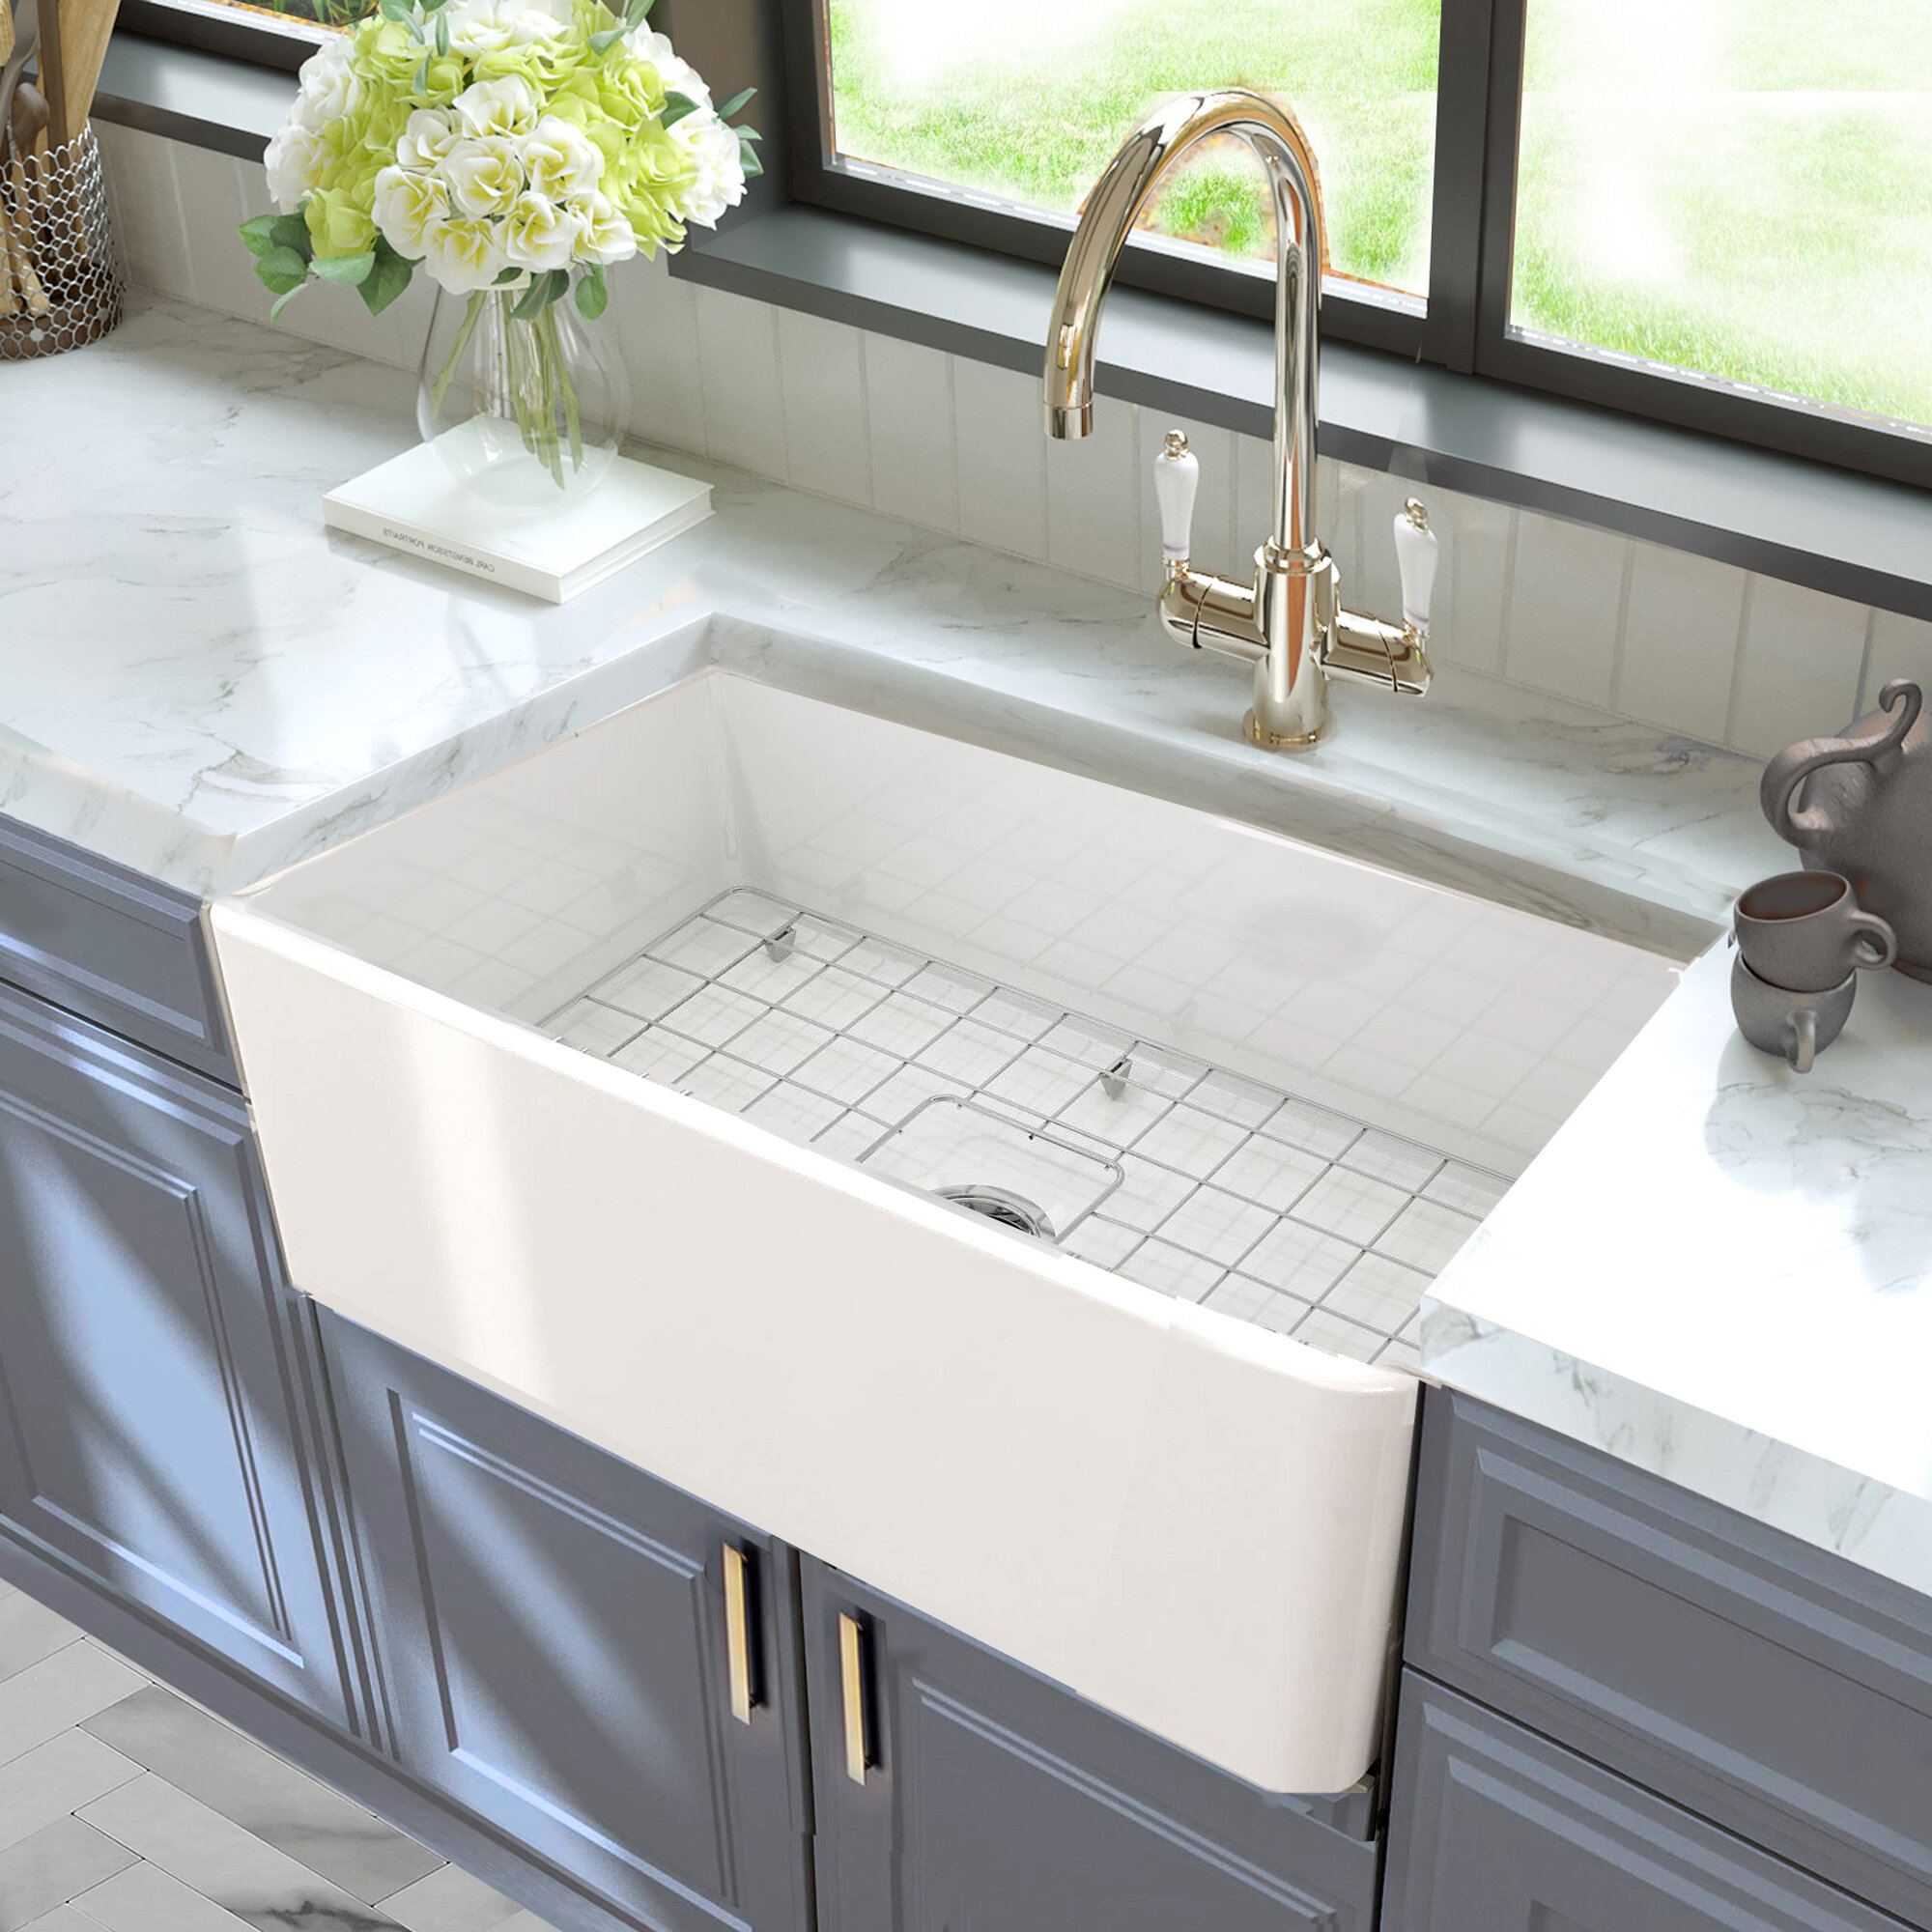 Nantucket Sinks Cape 30 L X 18 W Farmhouse Kitchen Sink With Basket Strainer Reviews Wayfair